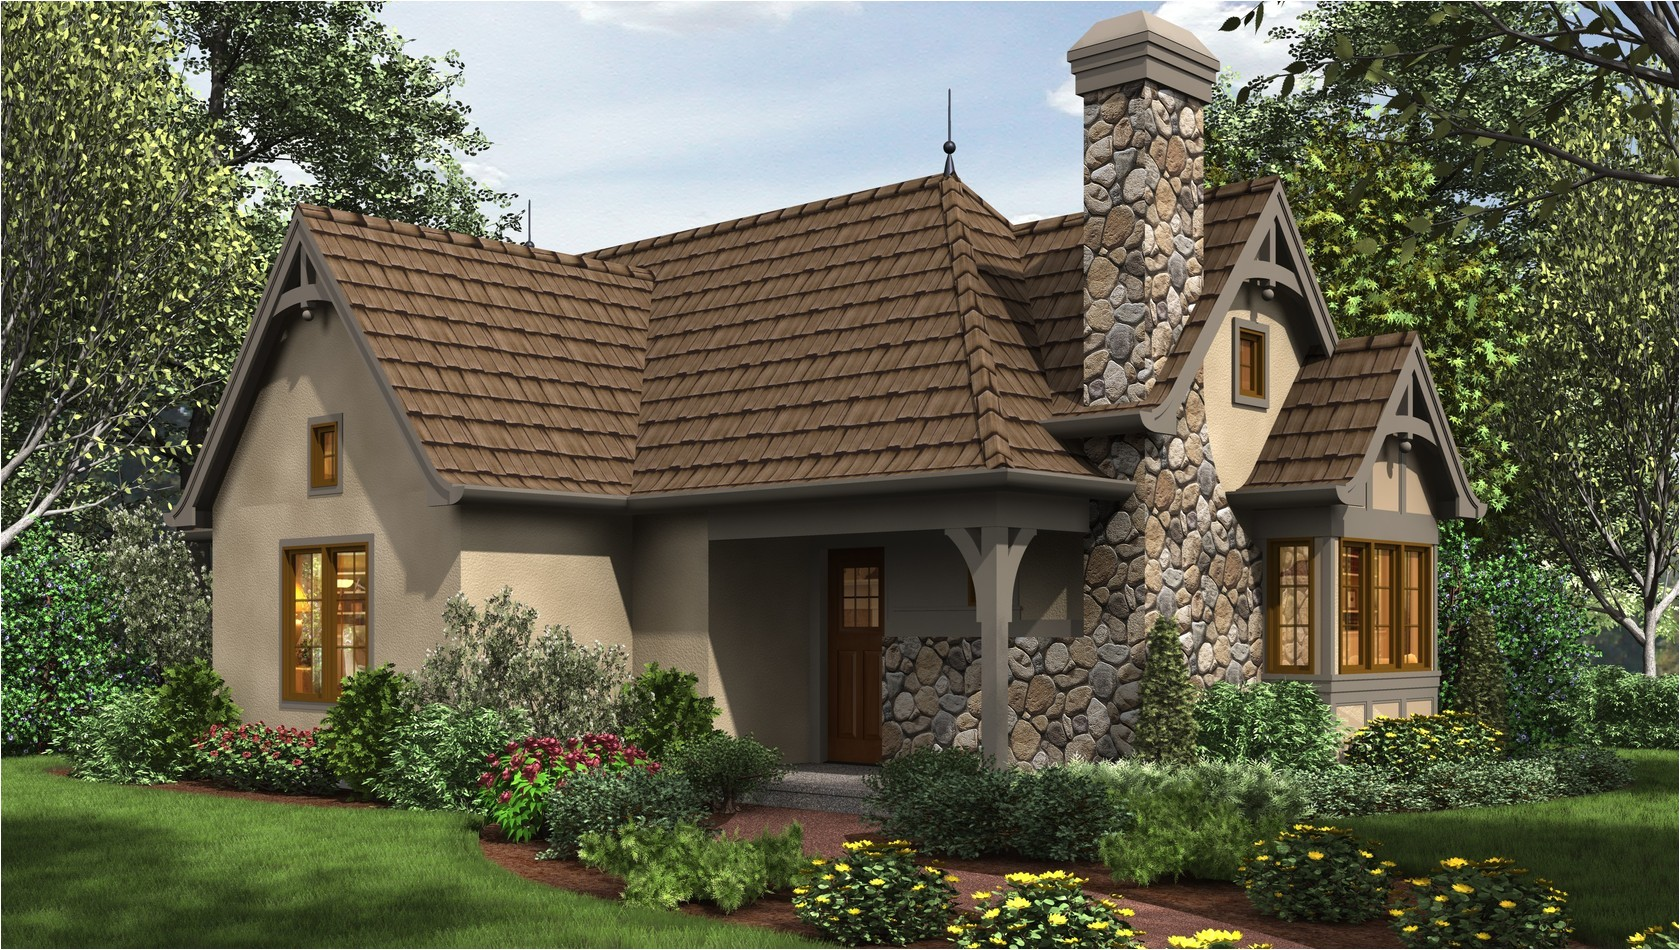 13 simple whimsical house plans ideas photo